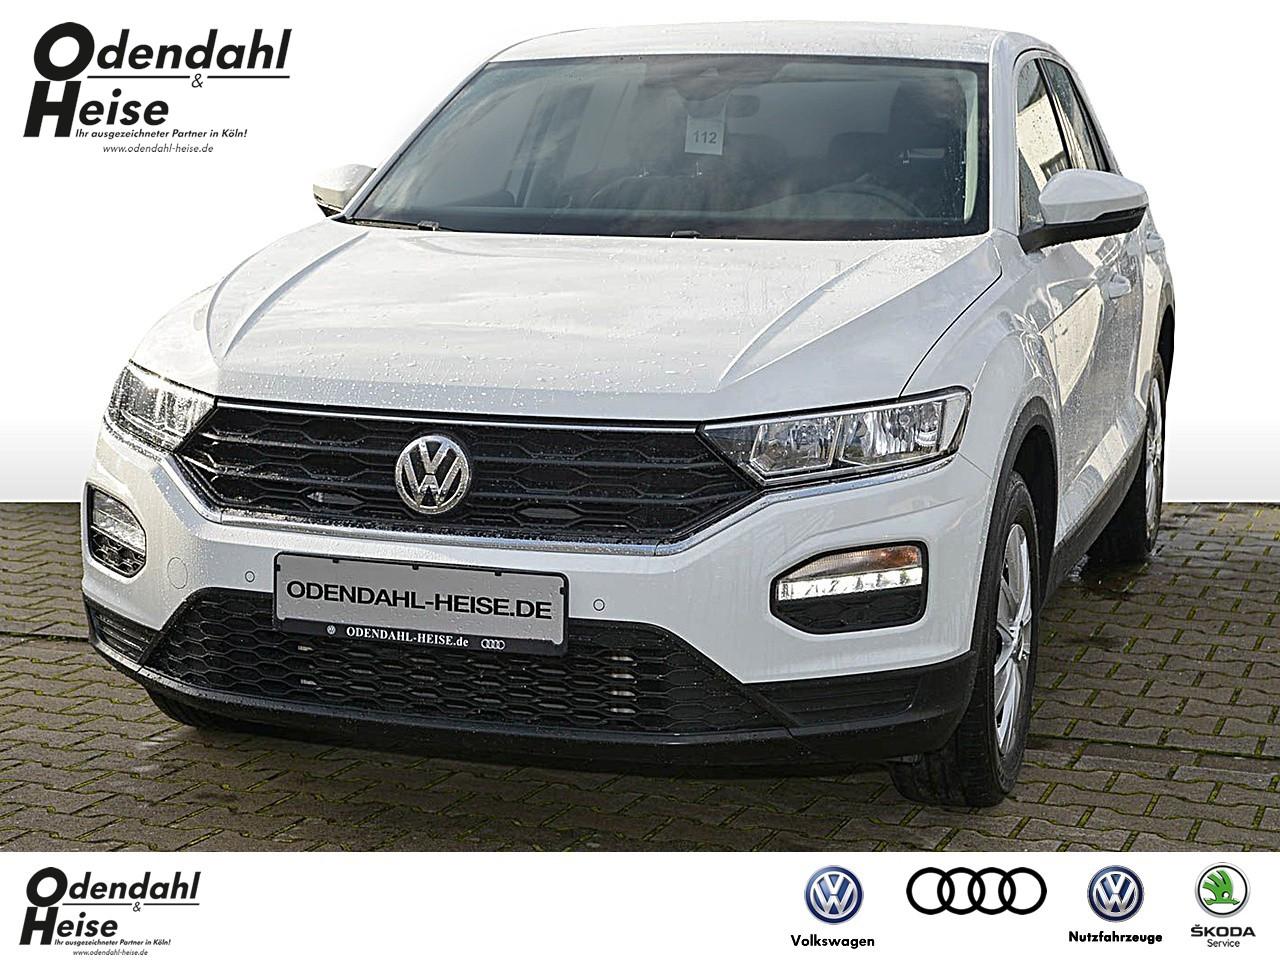 Volkswagen T-Roc 1.0 l TSI 6-Gang EU6 Klima Einparkhilfe, Jahr 2018, Benzin